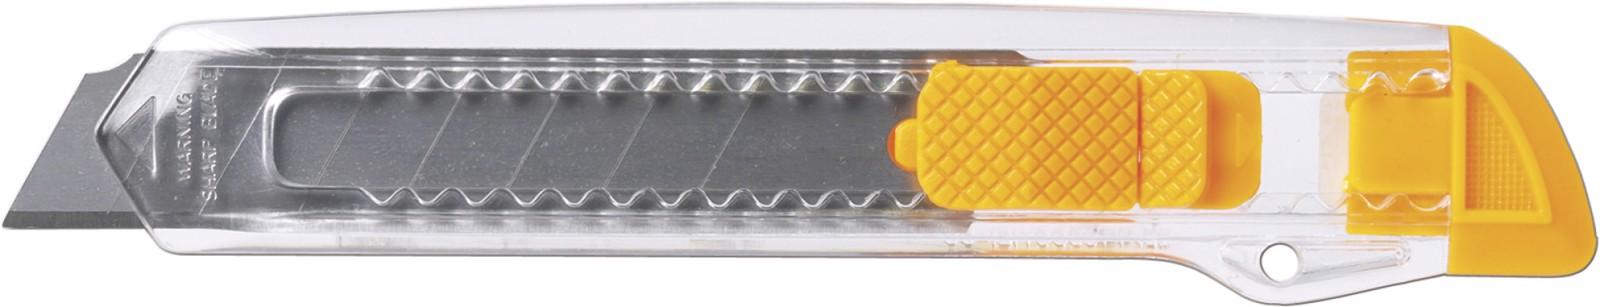 Metal hobby knife - Yellow